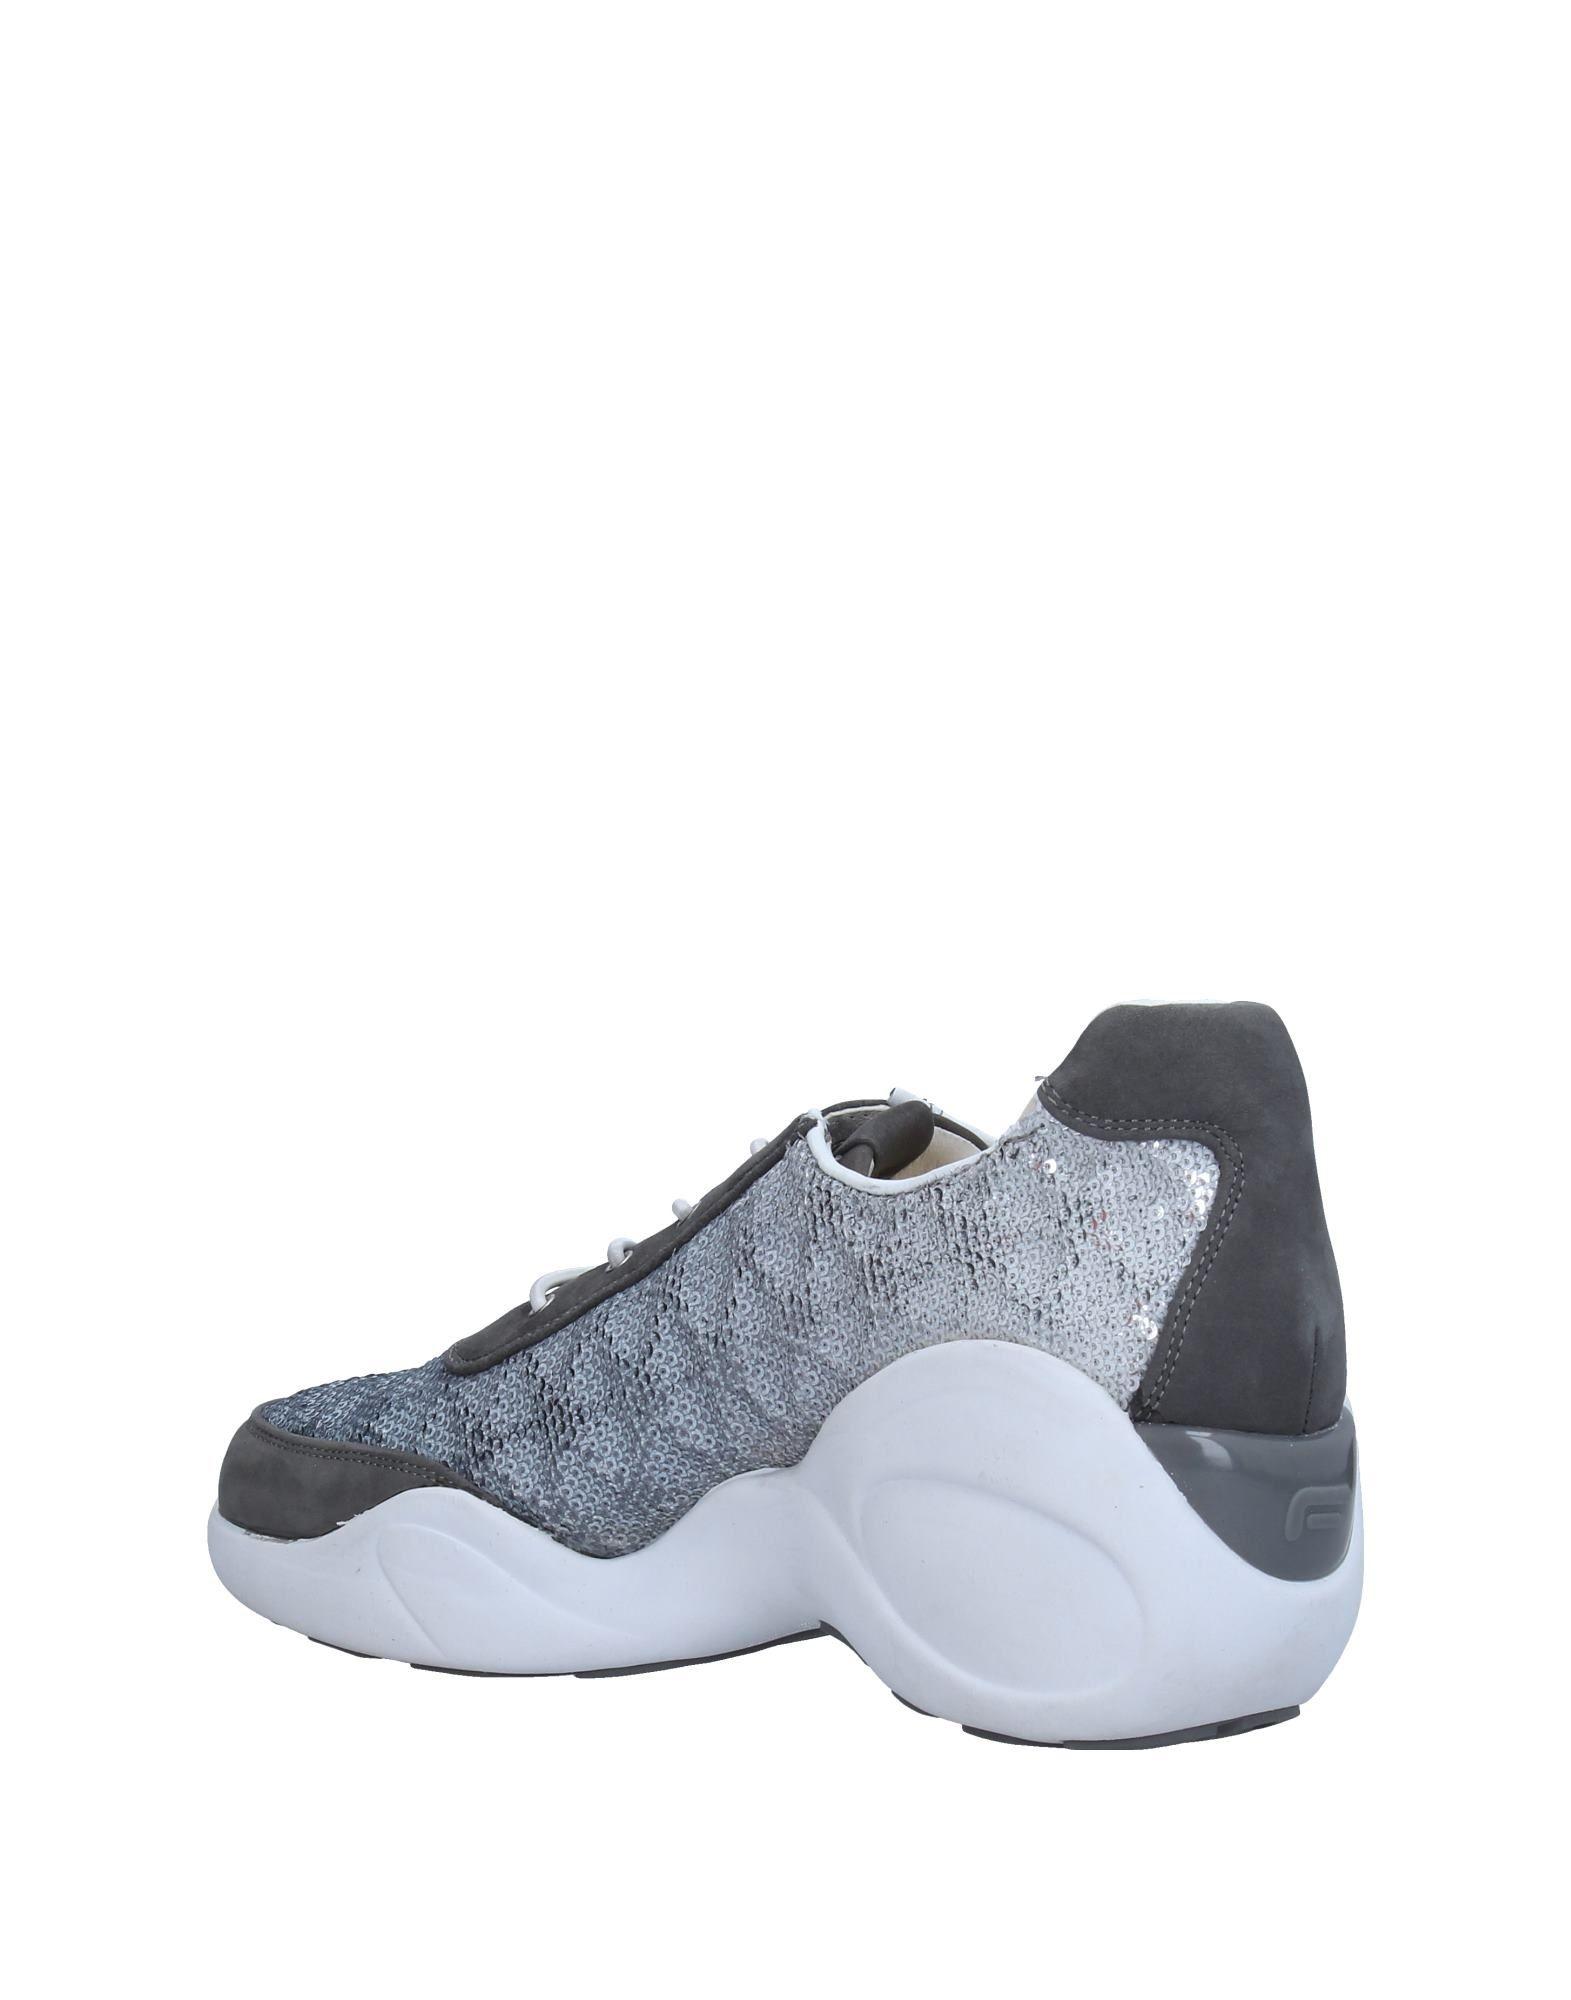 Fornarina Sneakers Damen  11326044EV Gute Qualität beliebte Schuhe